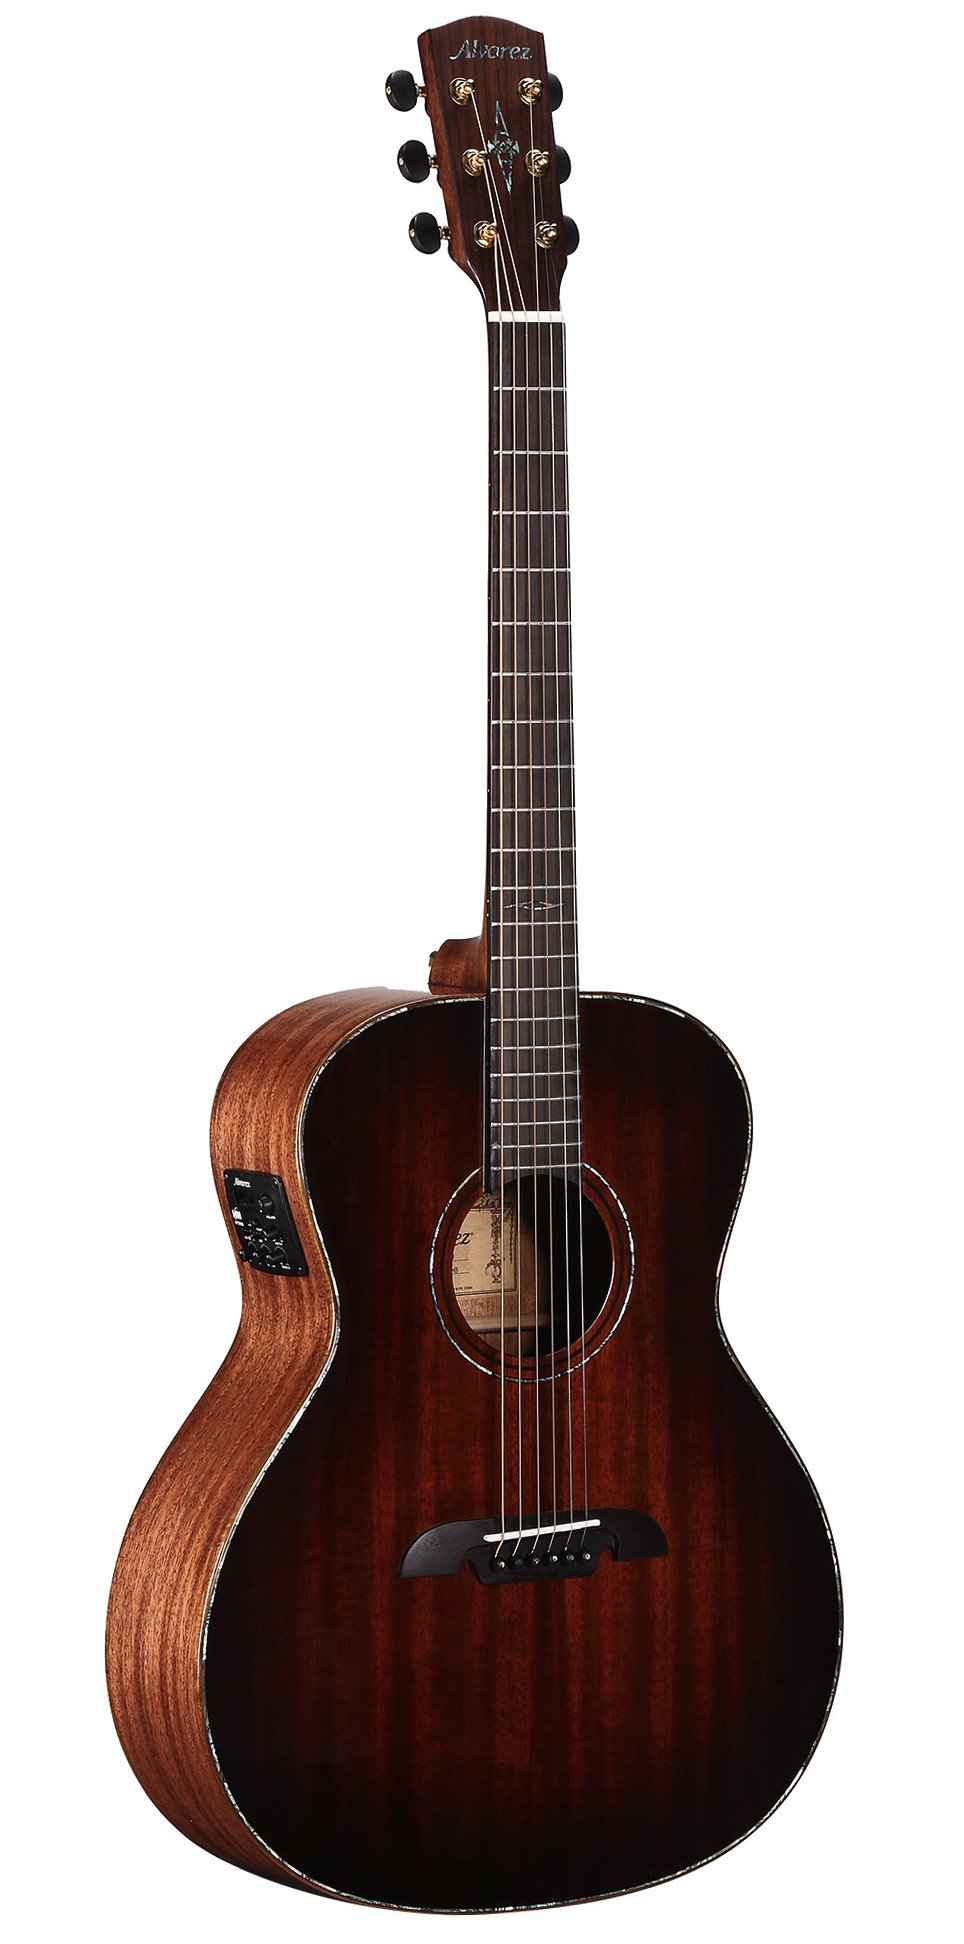 Alvarez MGA66ESHB-BB Grand Auditorium elektro-akustinė gitara